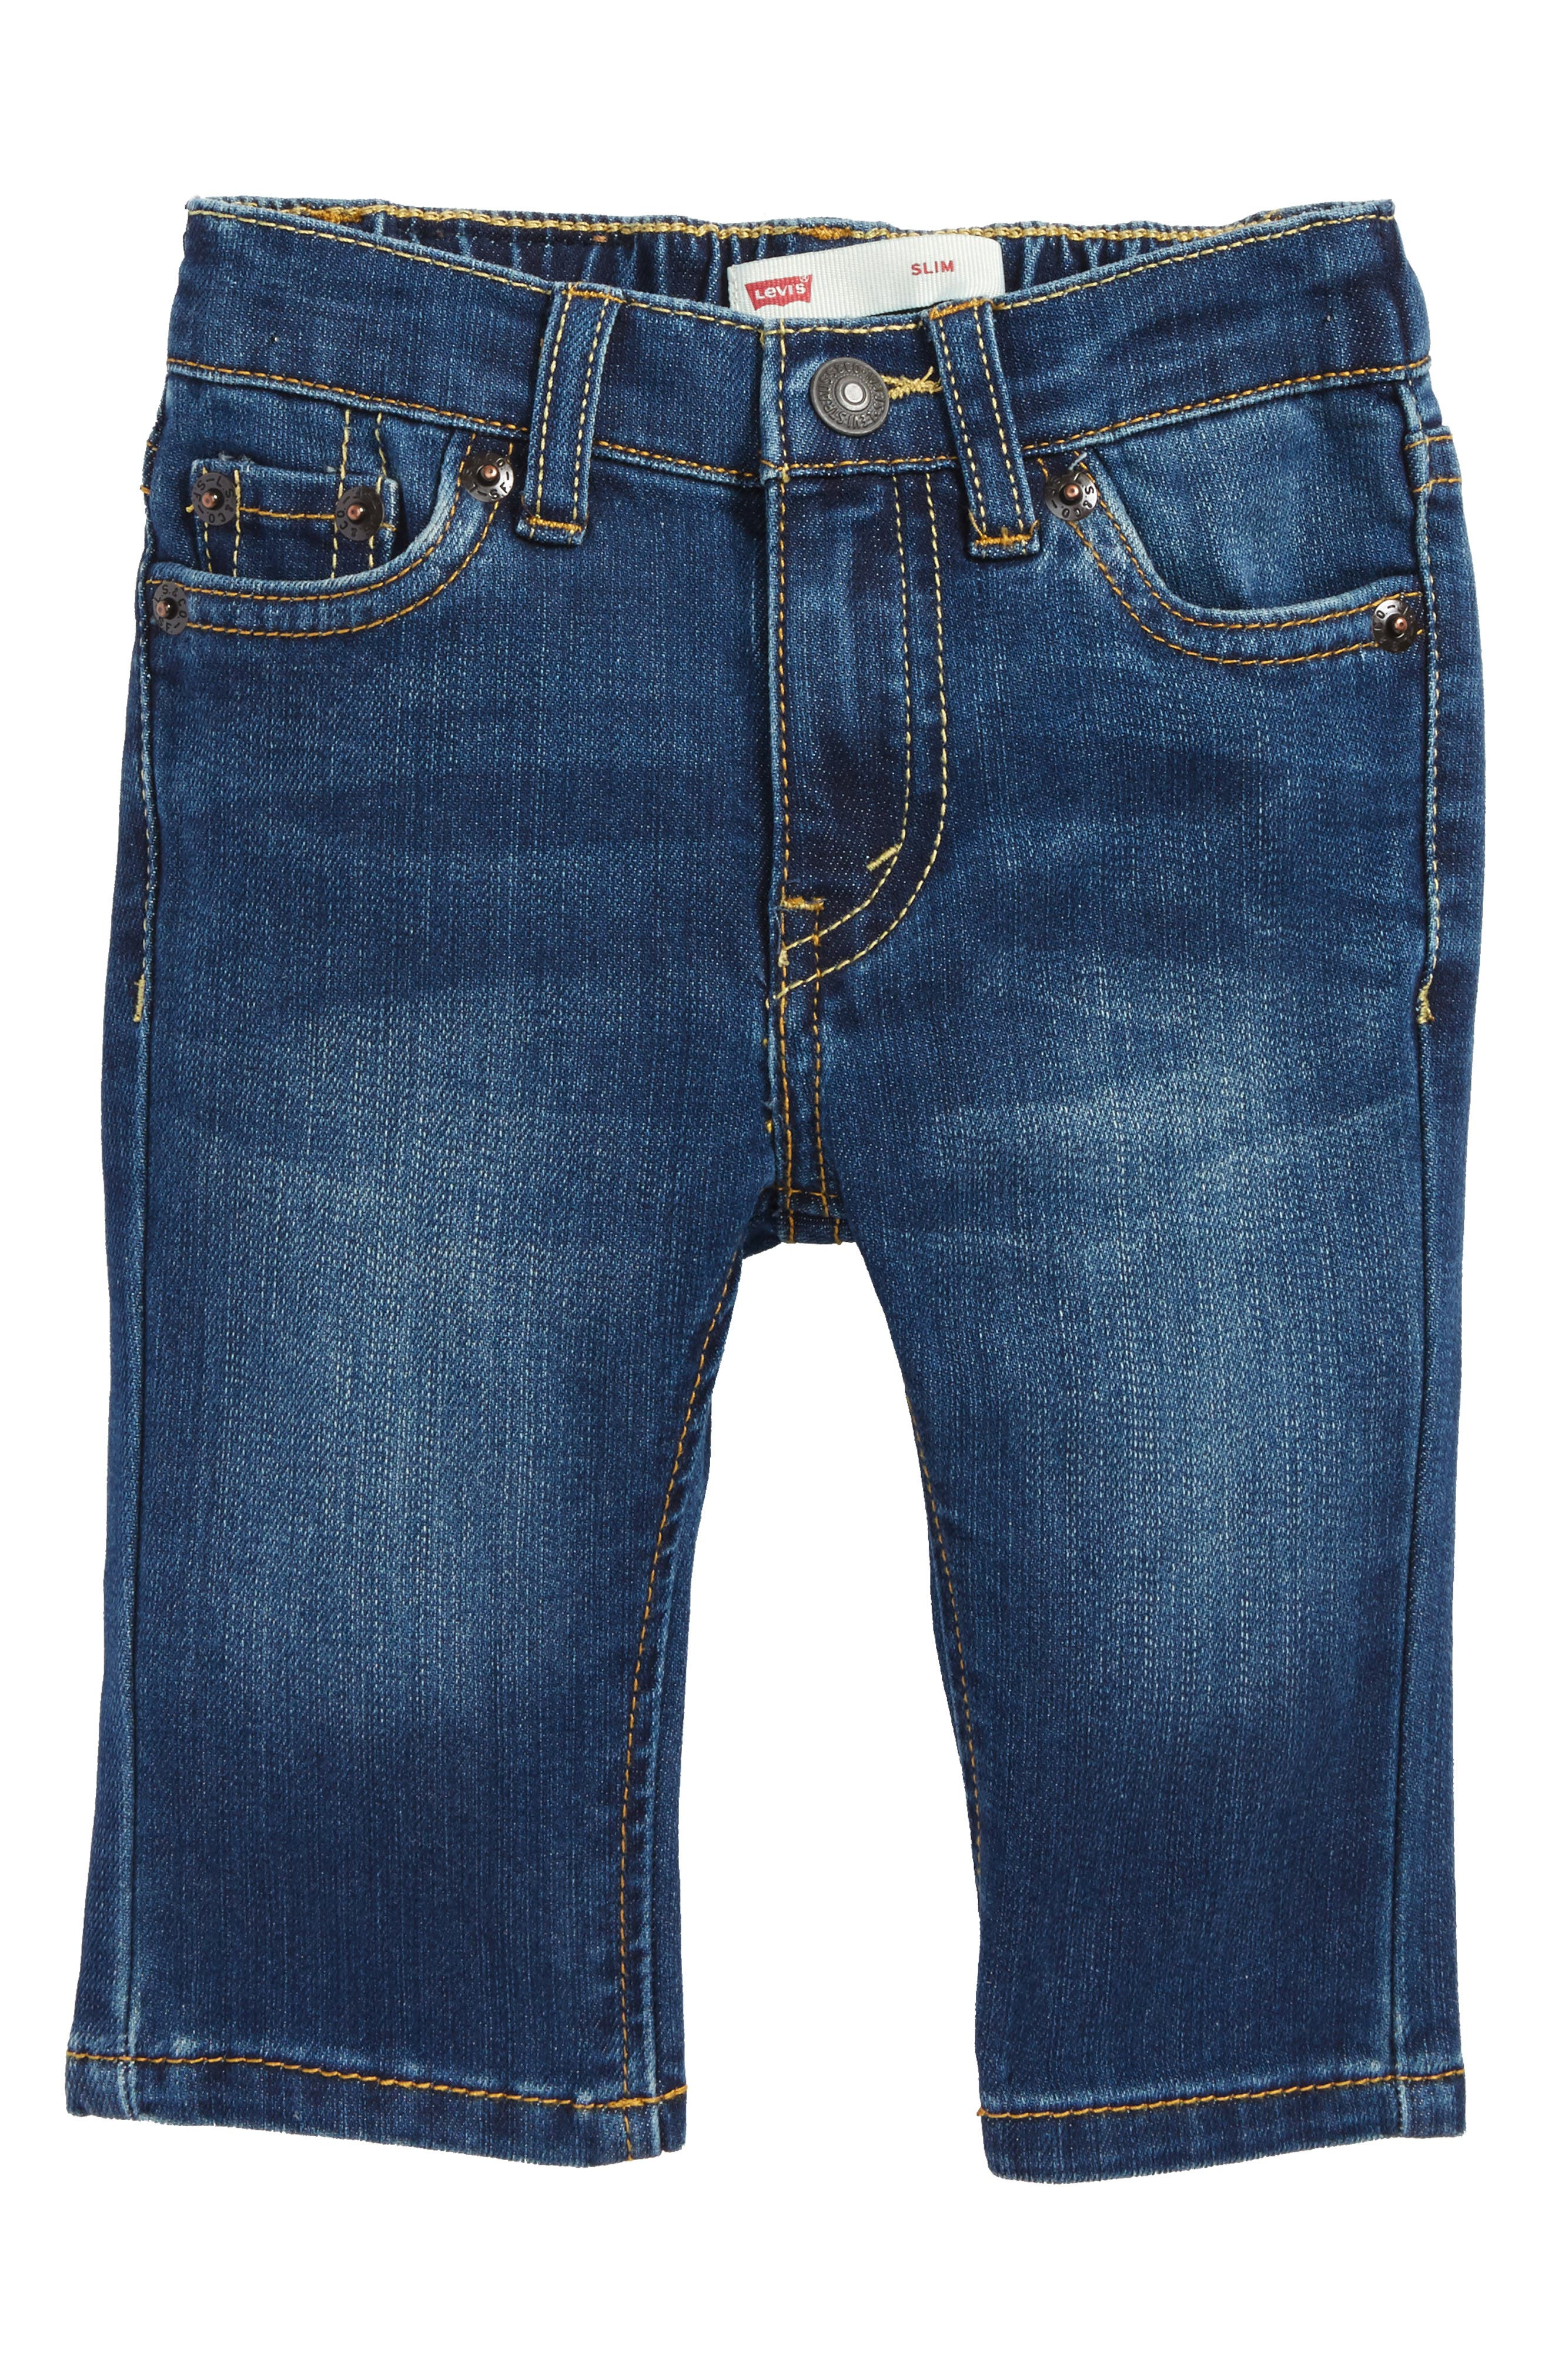 Comfort Slim Fit Jeans,                             Main thumbnail 1, color,                             422